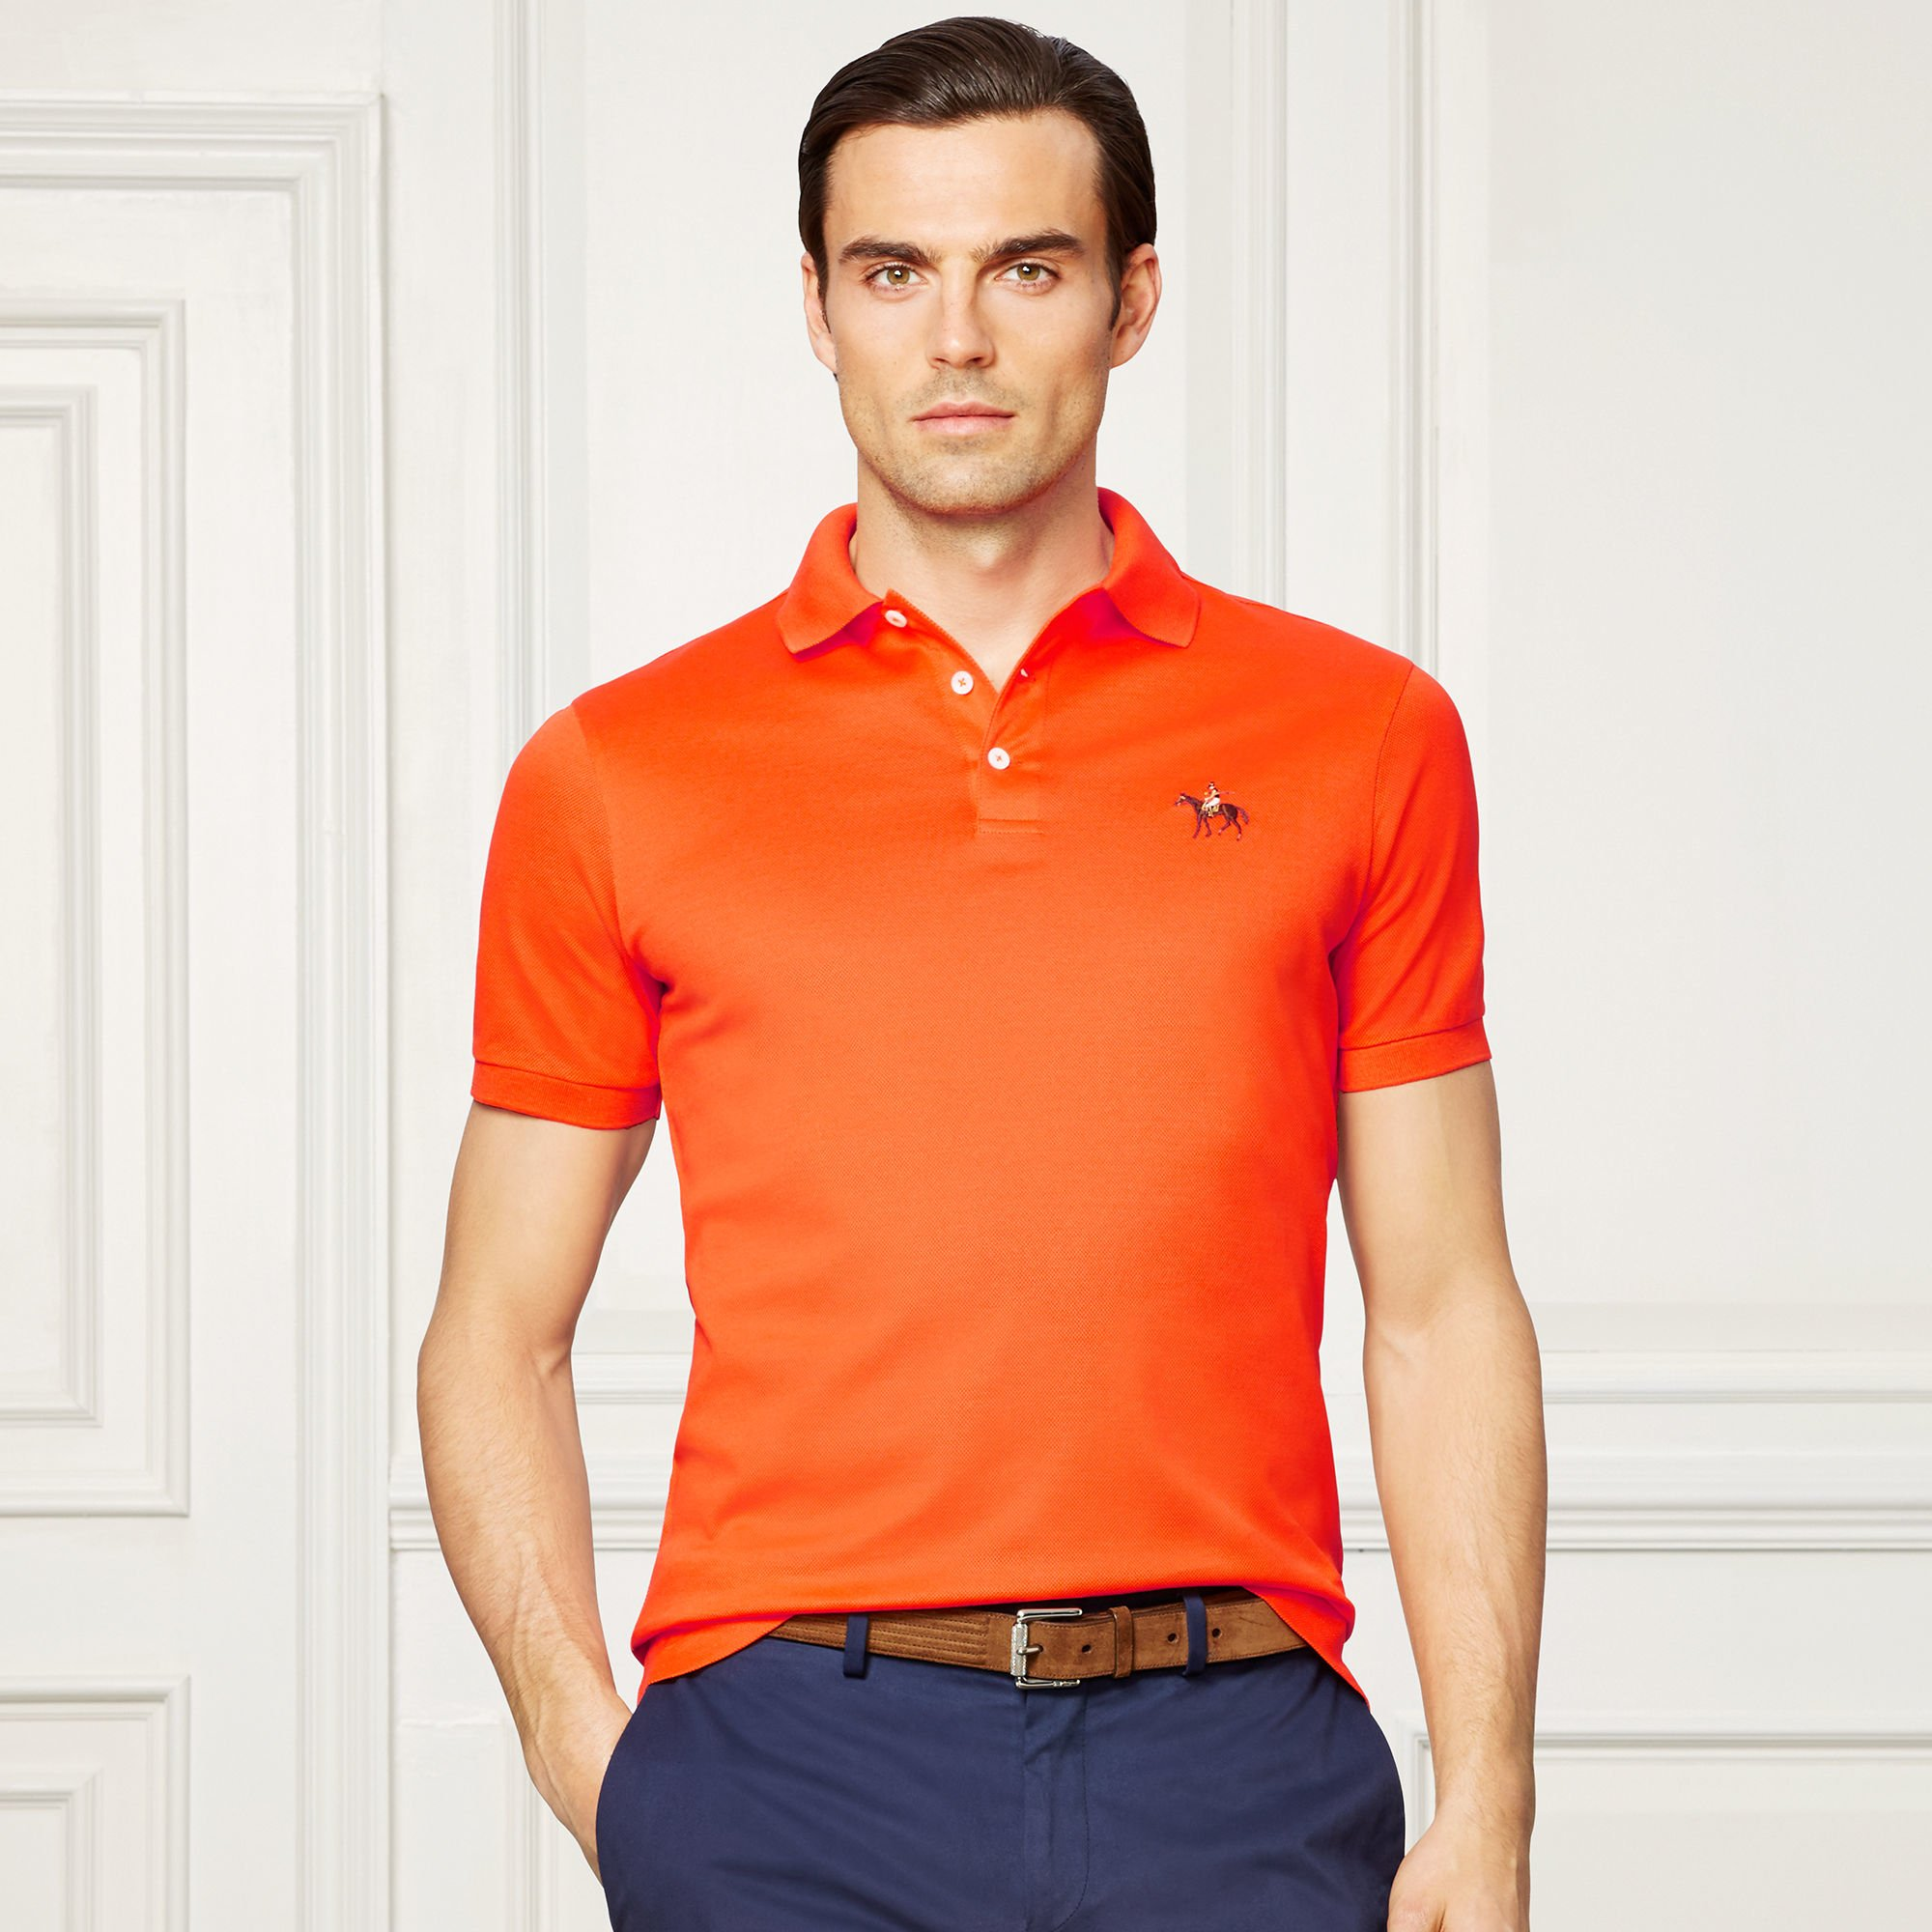 Lyst ralph lauren purple label custom fit piqu polo for Orange polo shirt mens